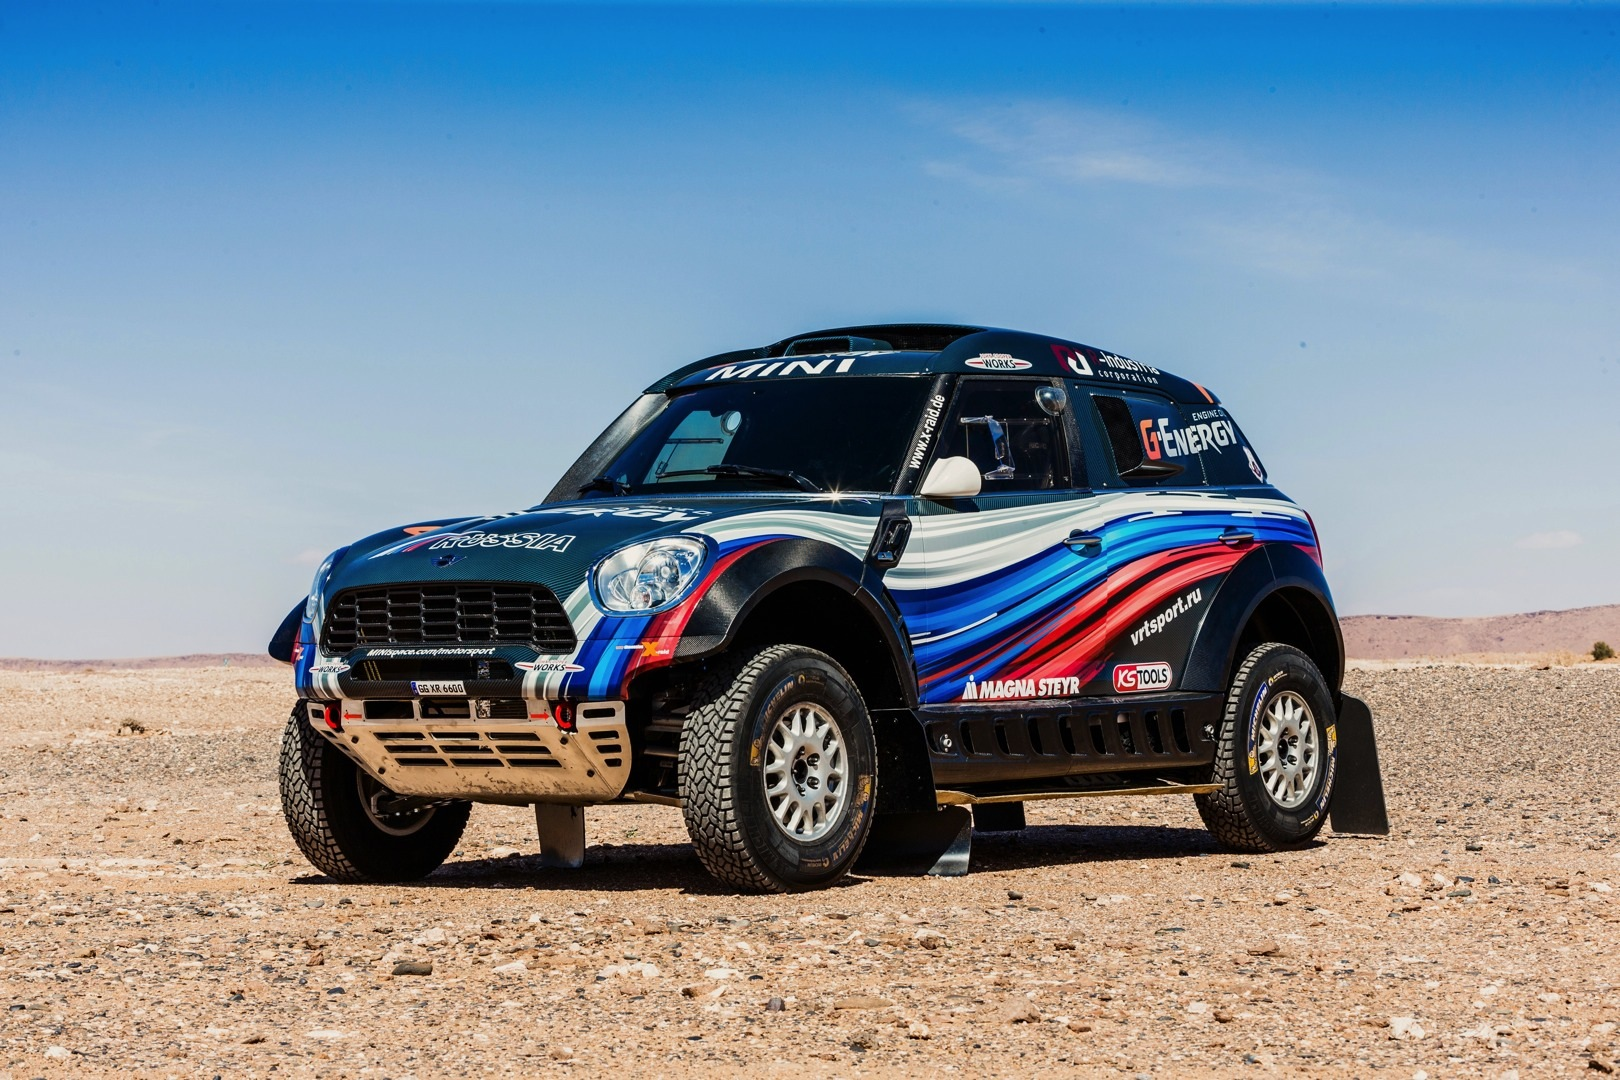 Eight MINI ALL4 Racing Cars Sign Up for 2015 Dakar Rally